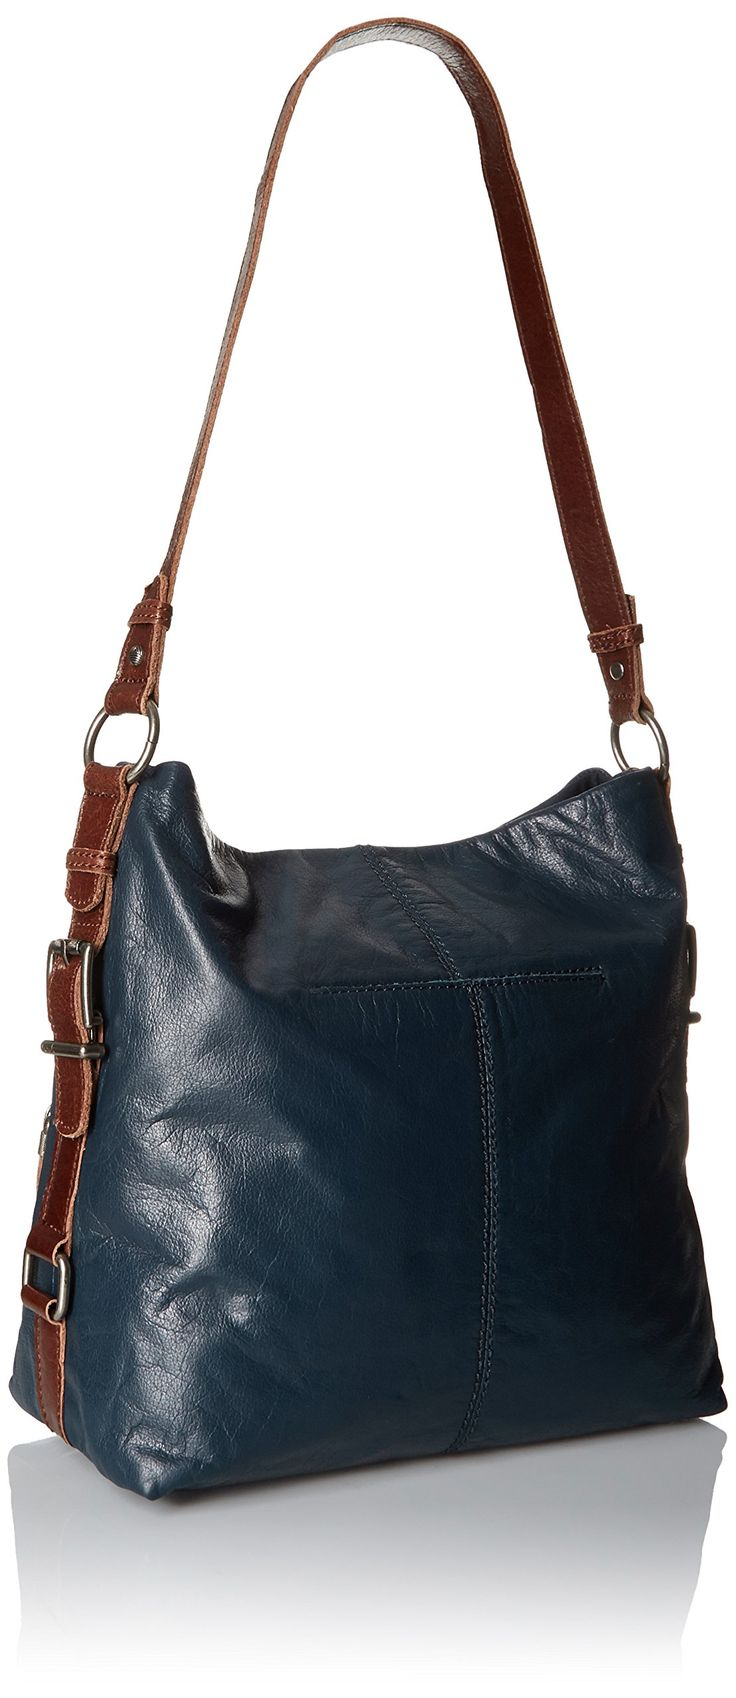 The SAK Sanibel Bucket Shoulder Bag, Black, One Size: Handbags: Amazon.com